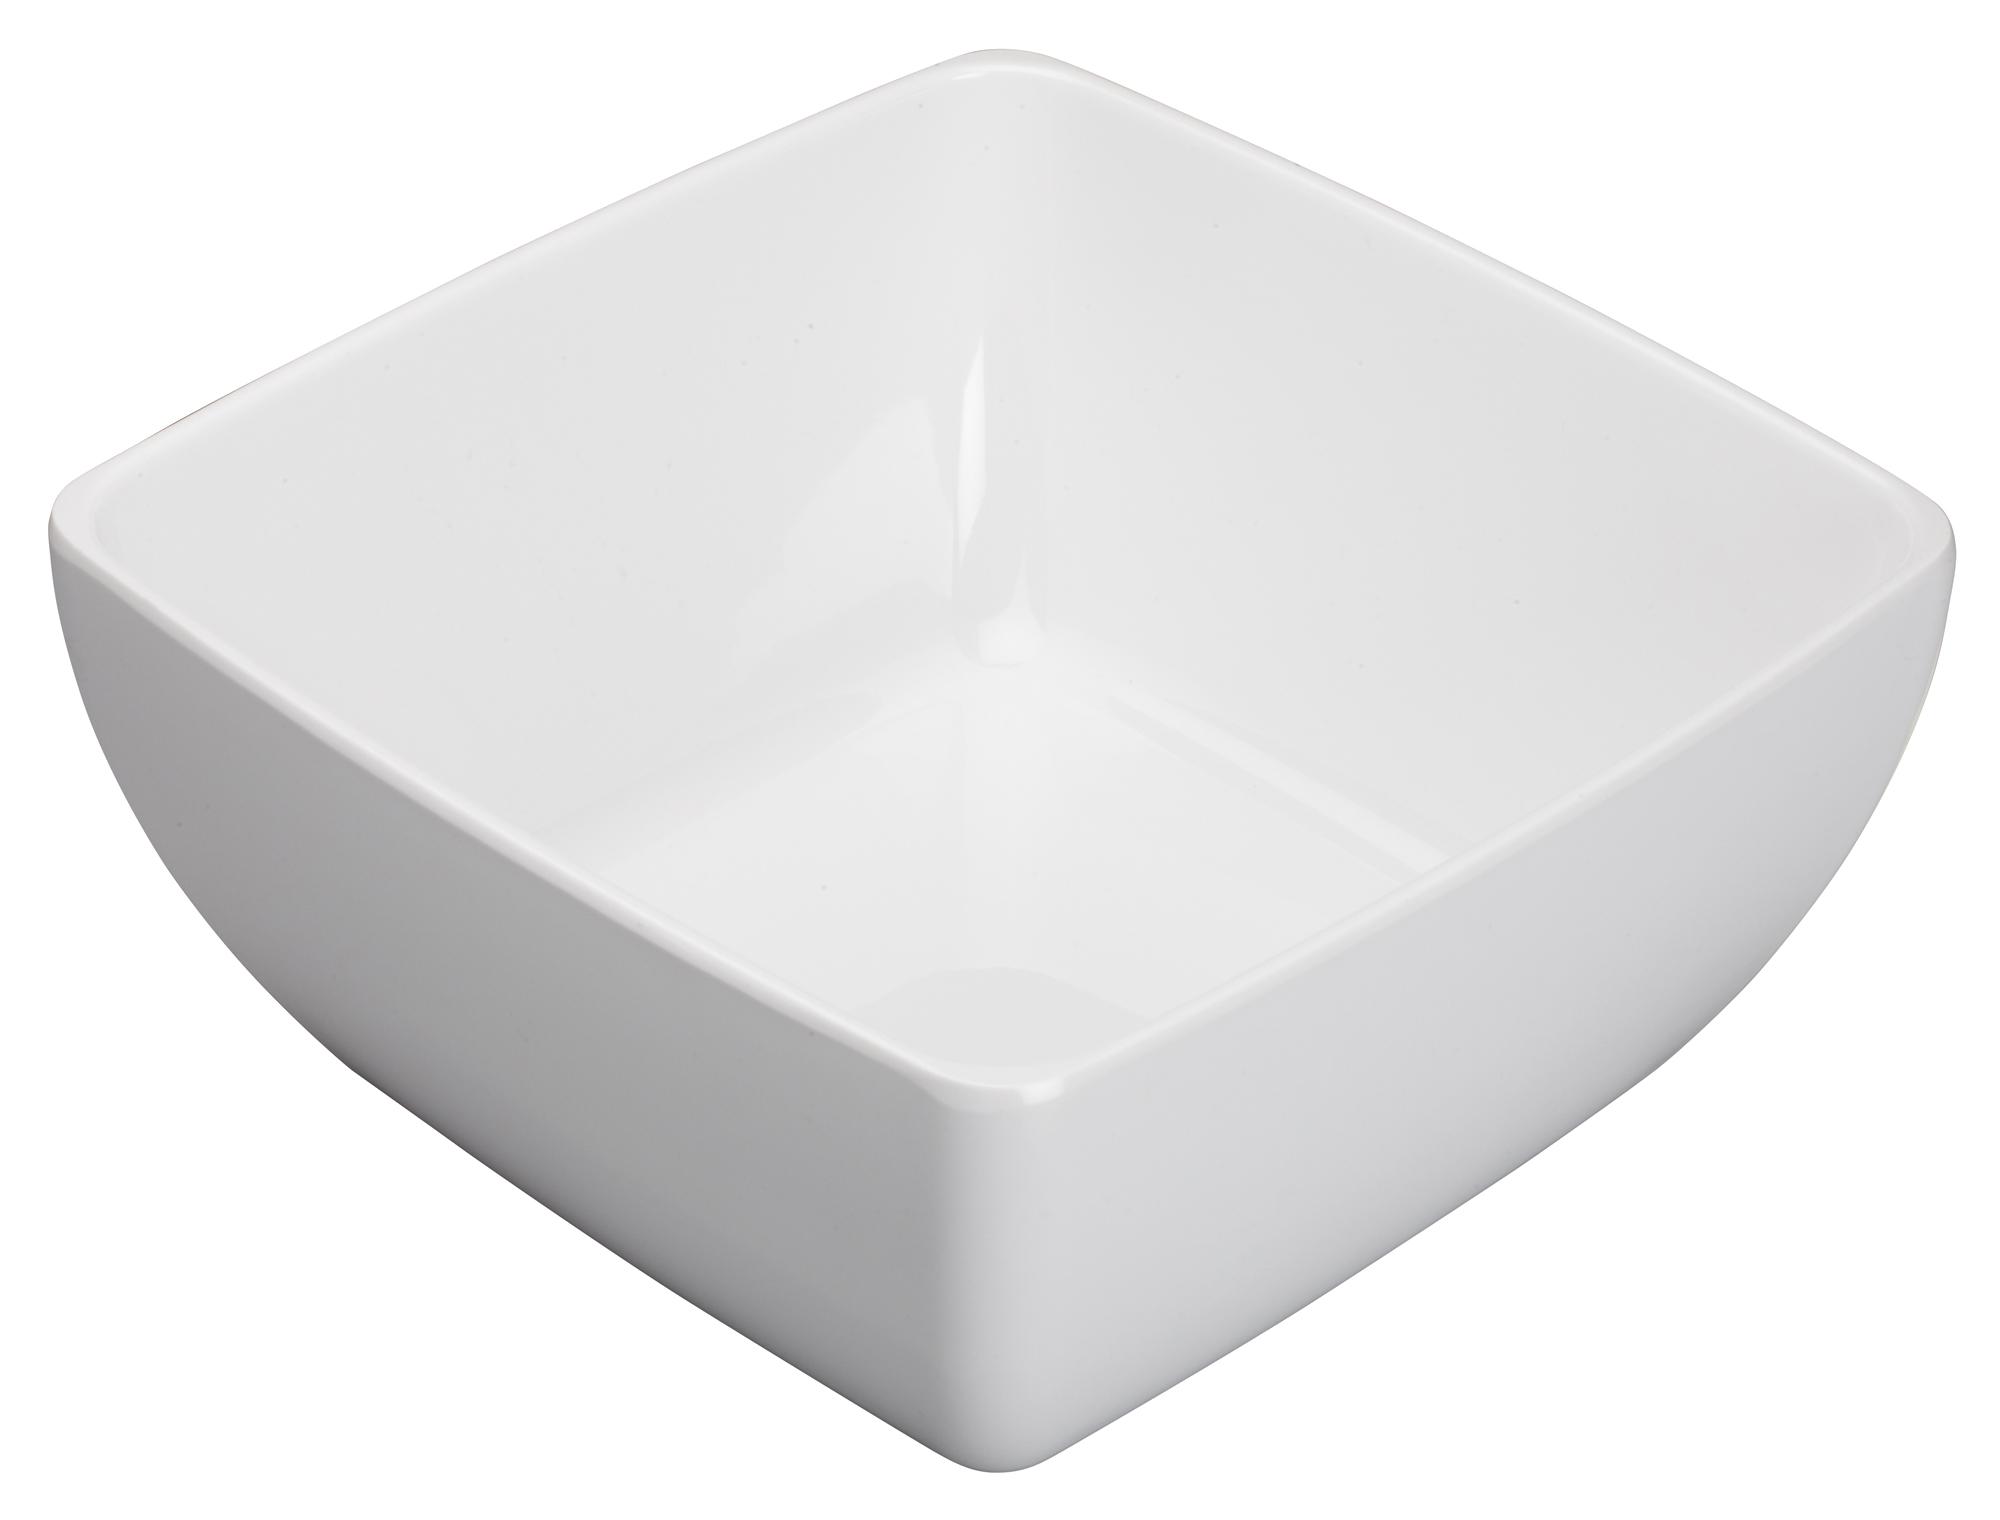 Winco WDM009-205 bowl, plastic,  5 - 6 qt (160 - 223 oz)